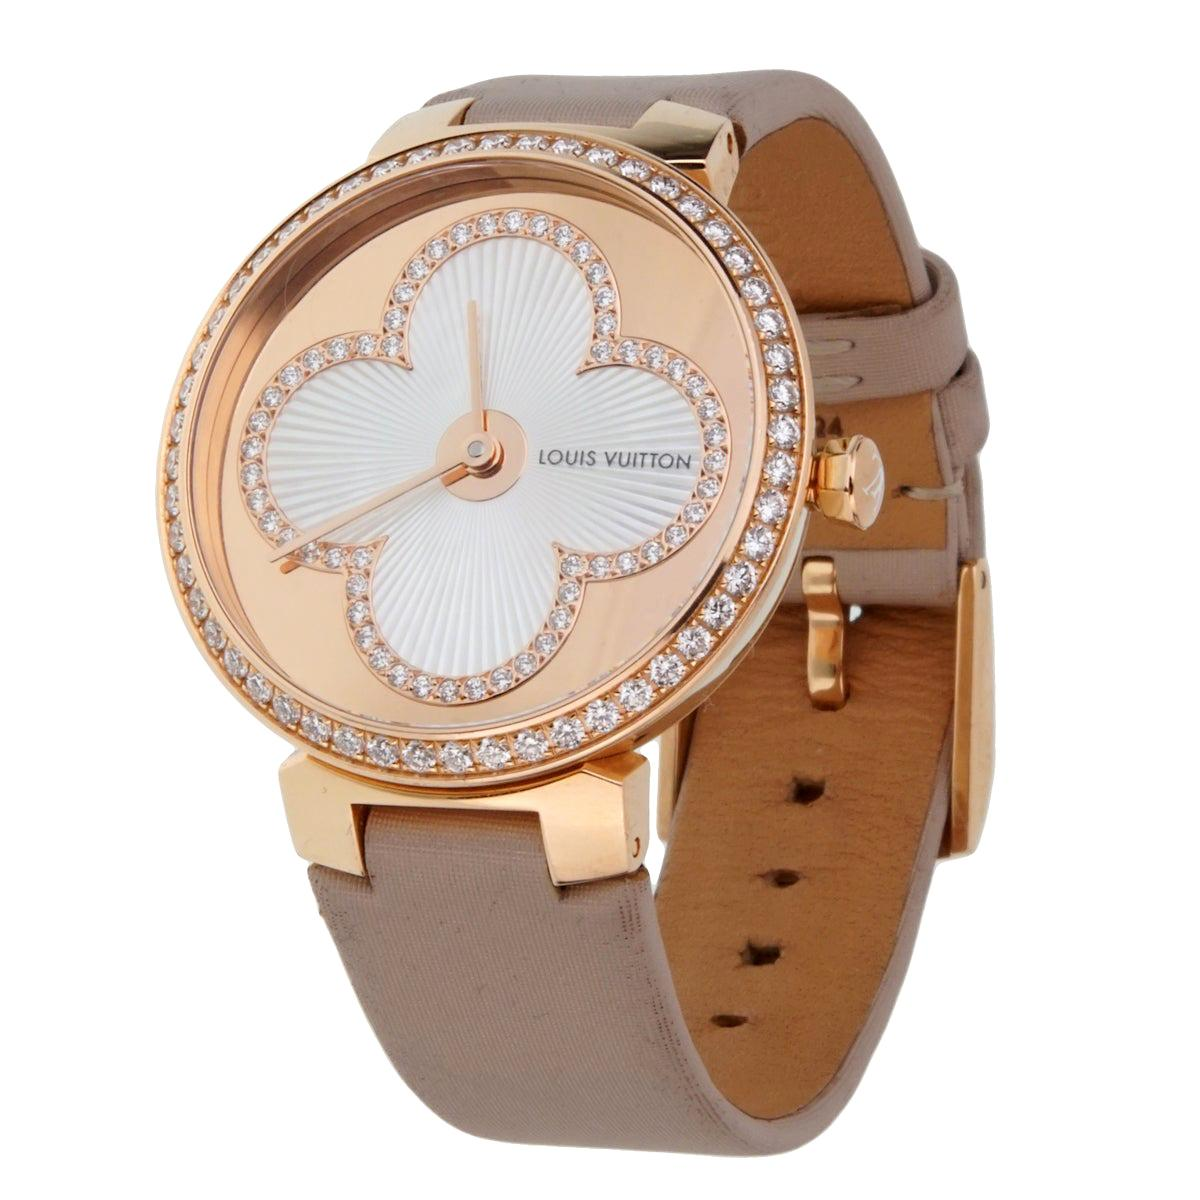 Louis Vuitton Tambour Blossom 35 Rose Gold Diamond Watch